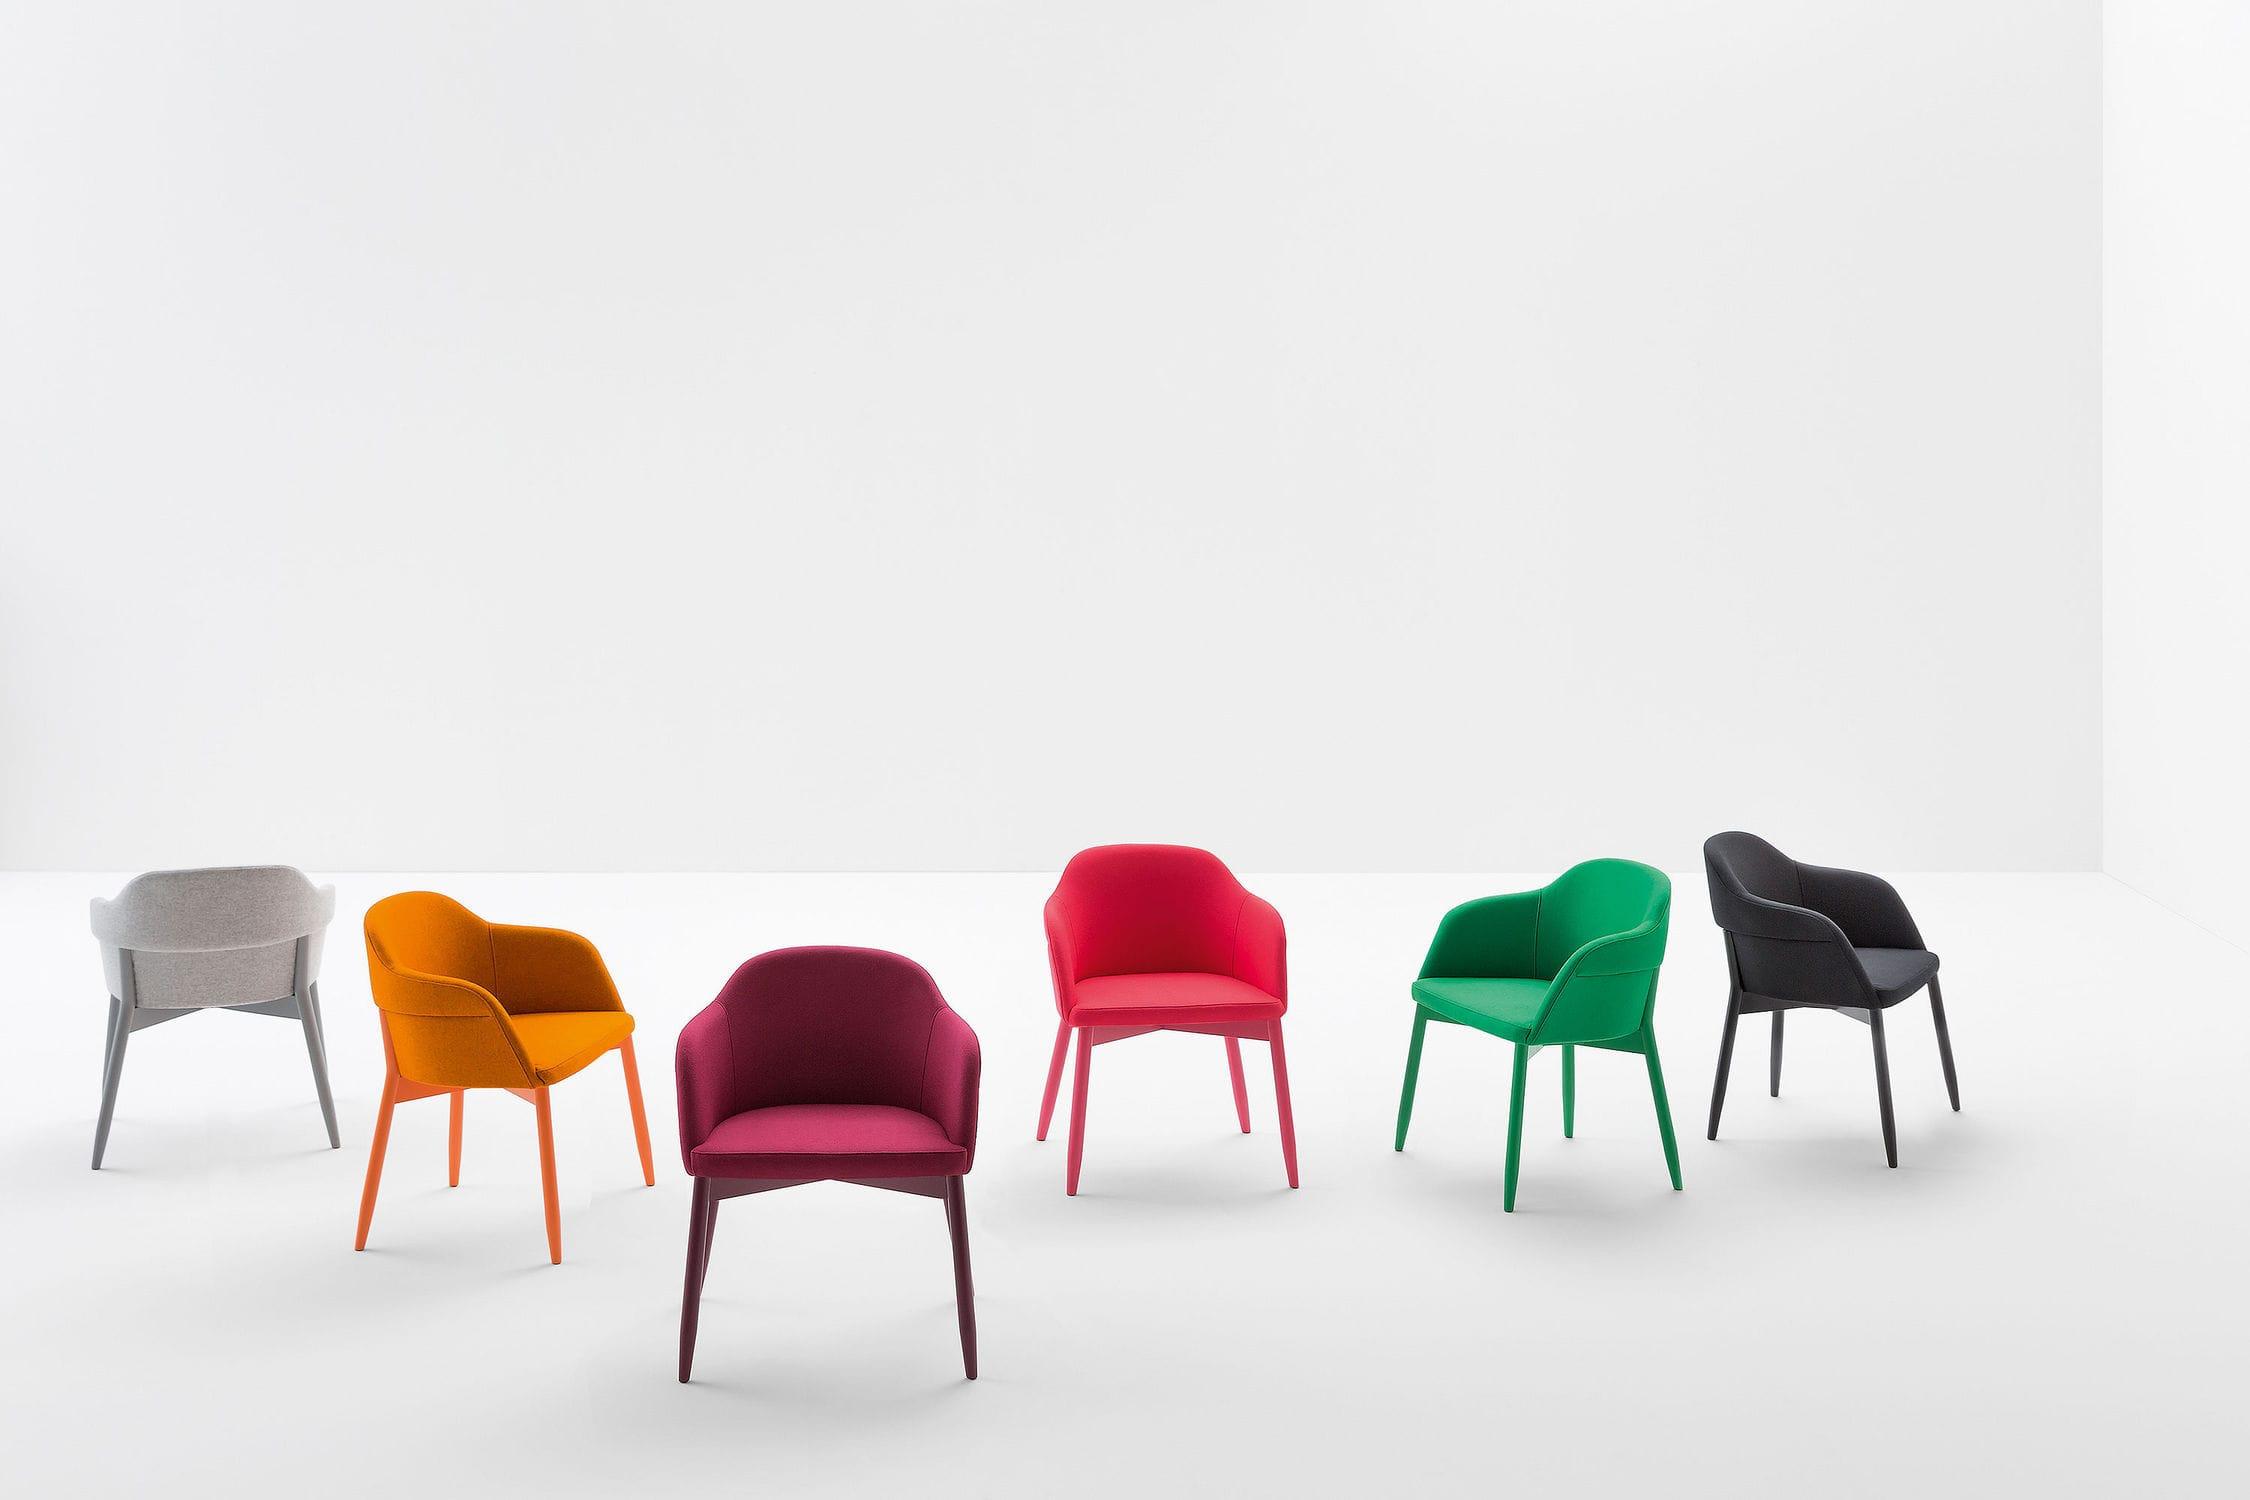 Sedia Imbottita Con Braccioli : Sedia moderna imbottita con braccioli in legno laccato spy